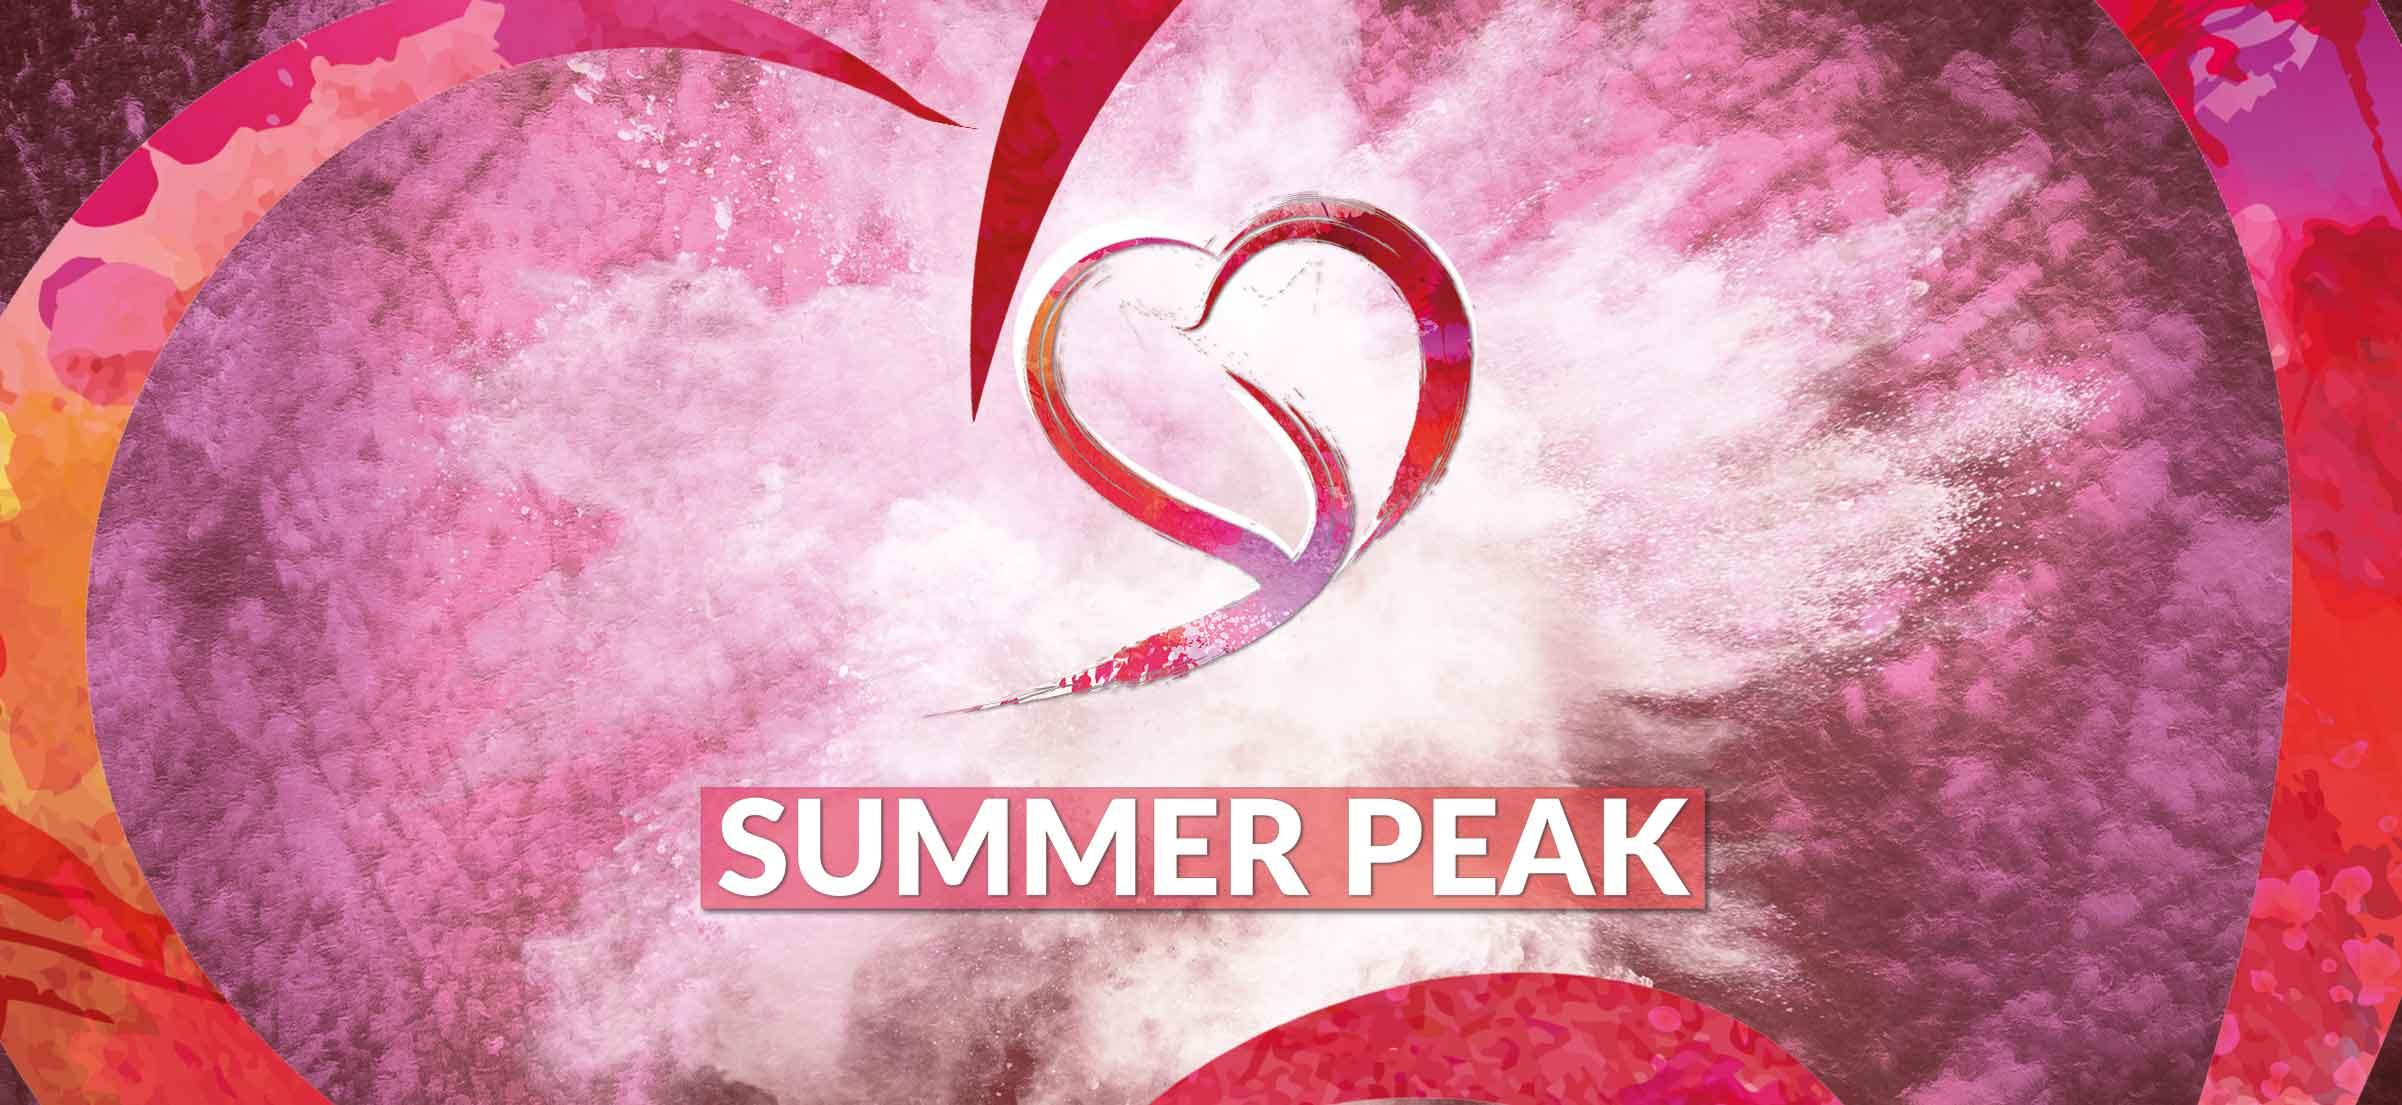 Summer Peak